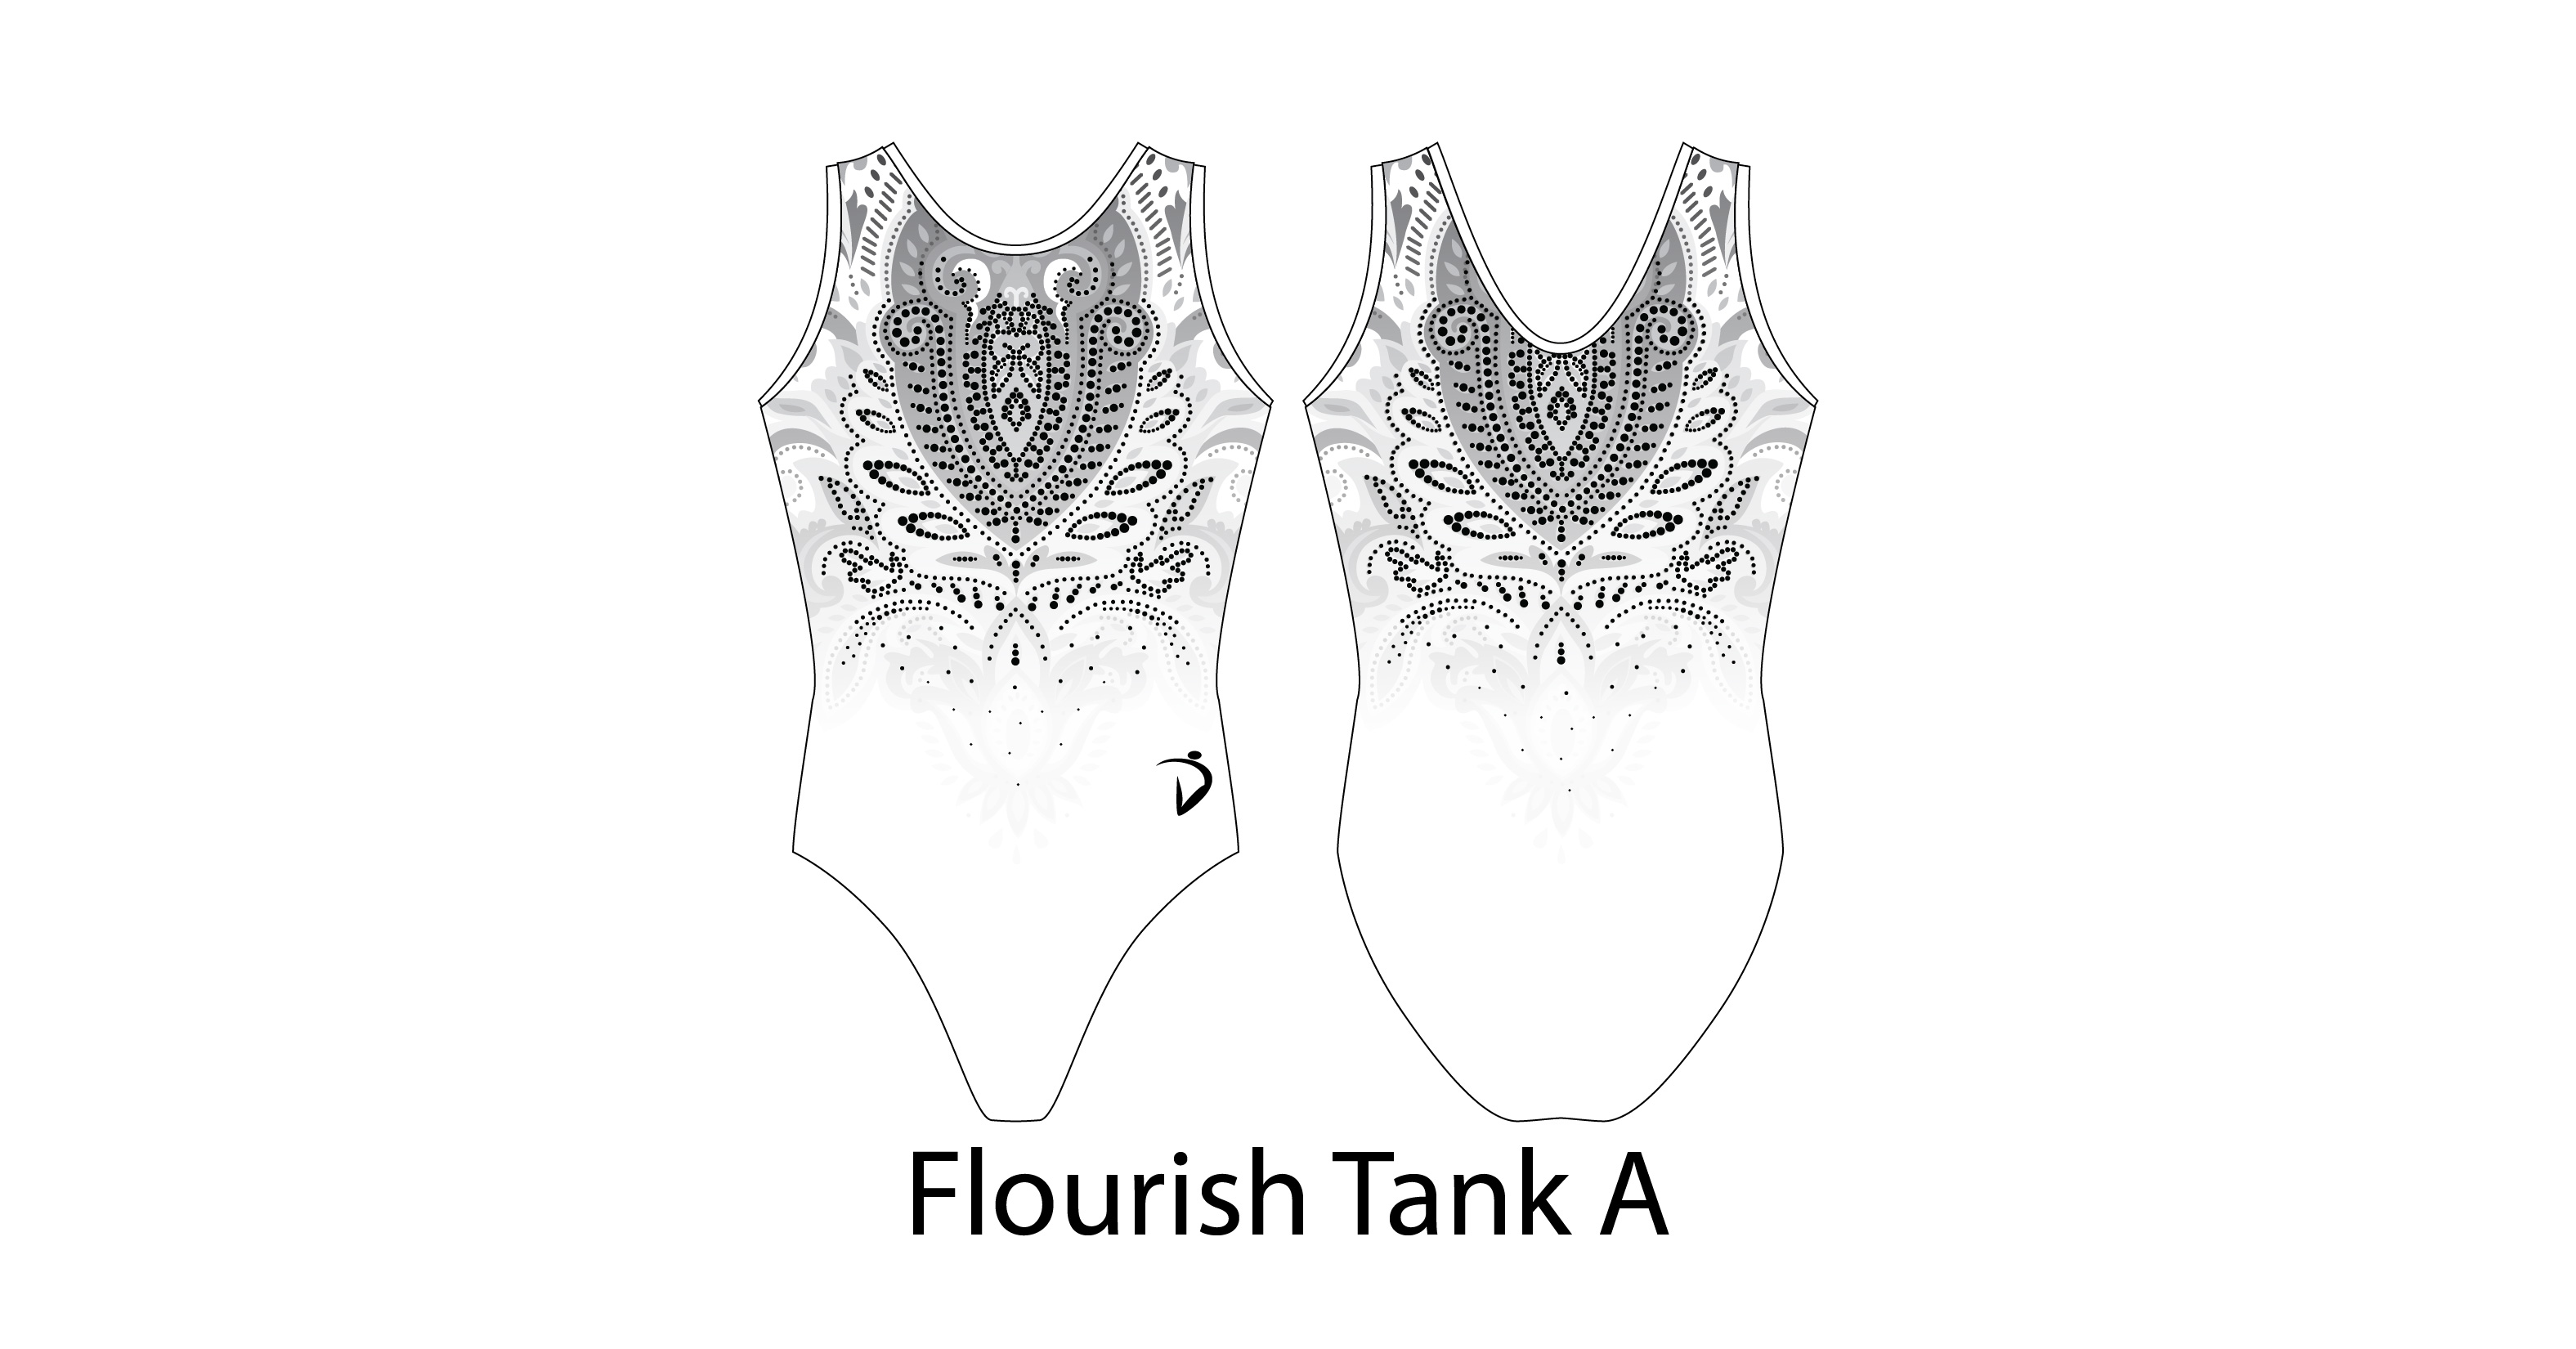 Flourish Tank A